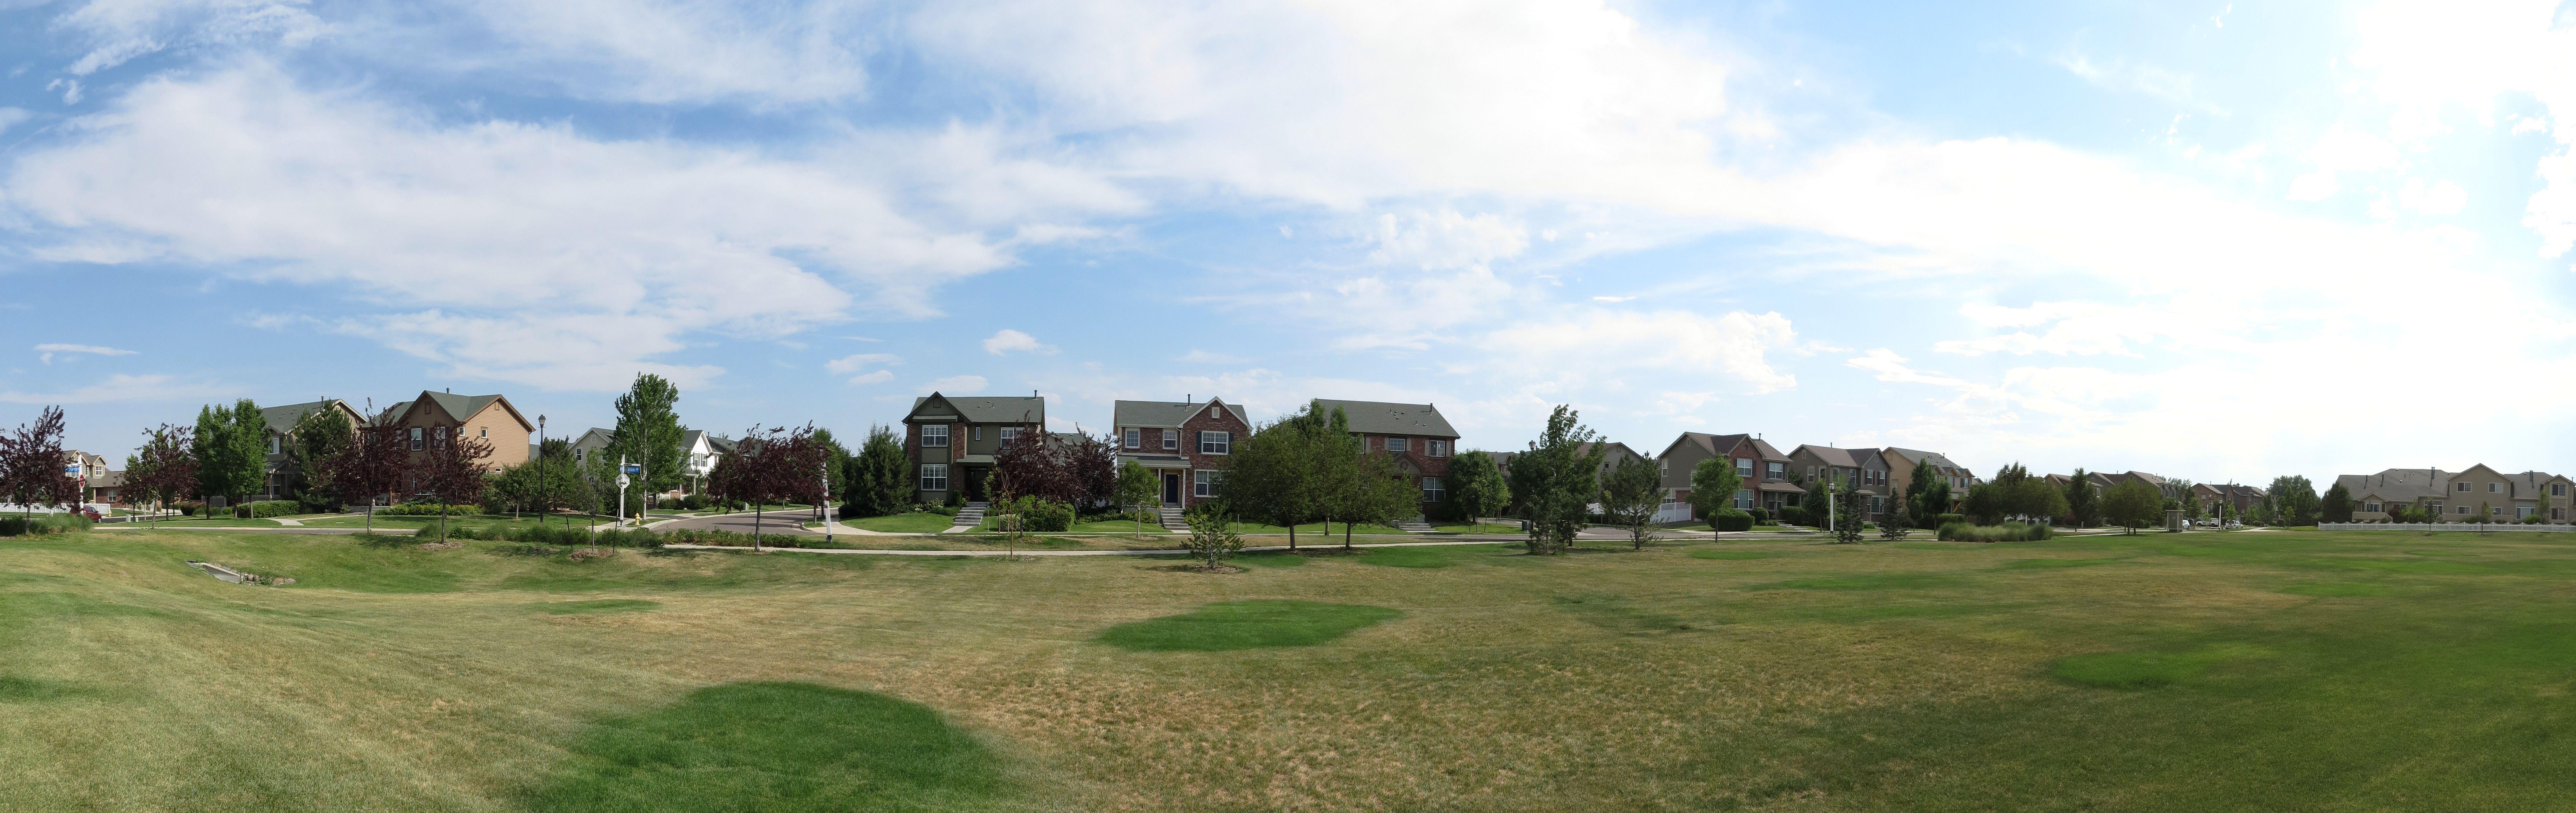 Homes For Sale Redleaf Broomfield Co